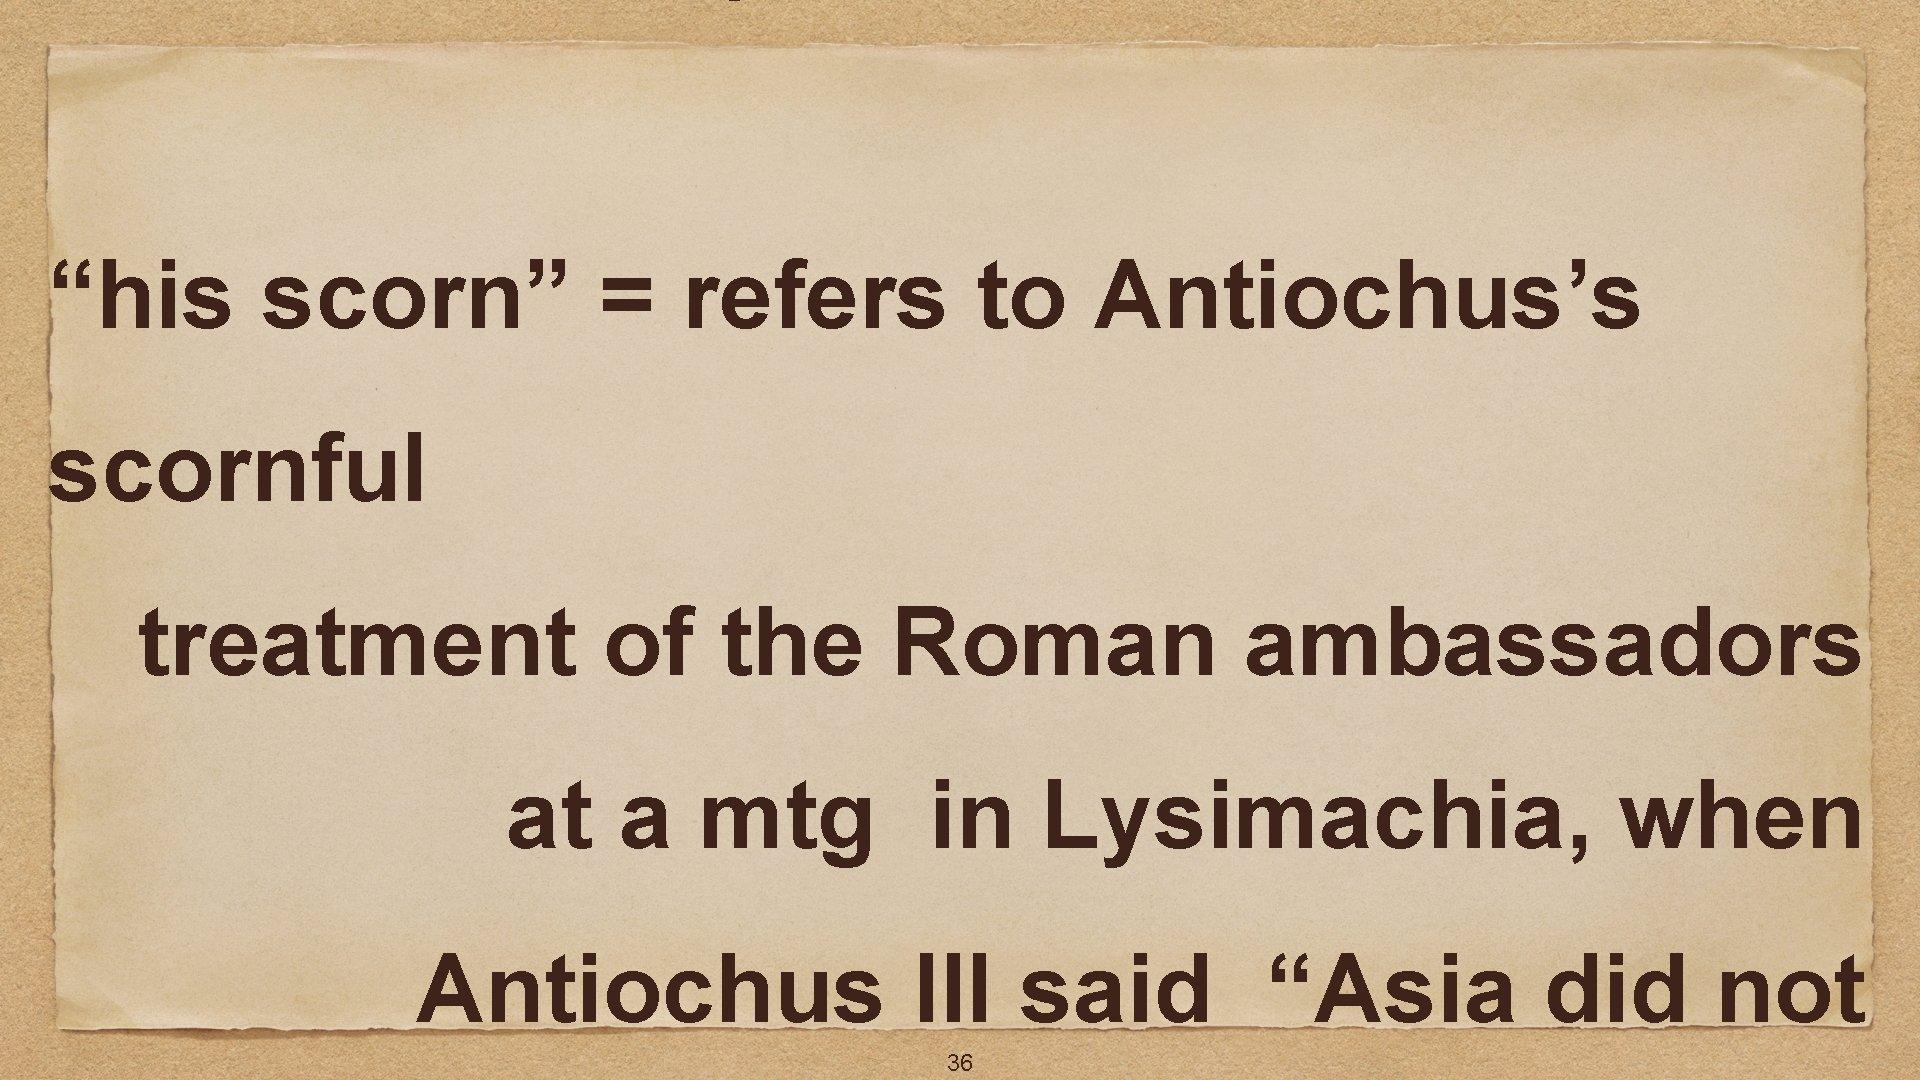 """his scorn"" = refers to Antiochus's scornful treatment of the Roman ambassadors at a"